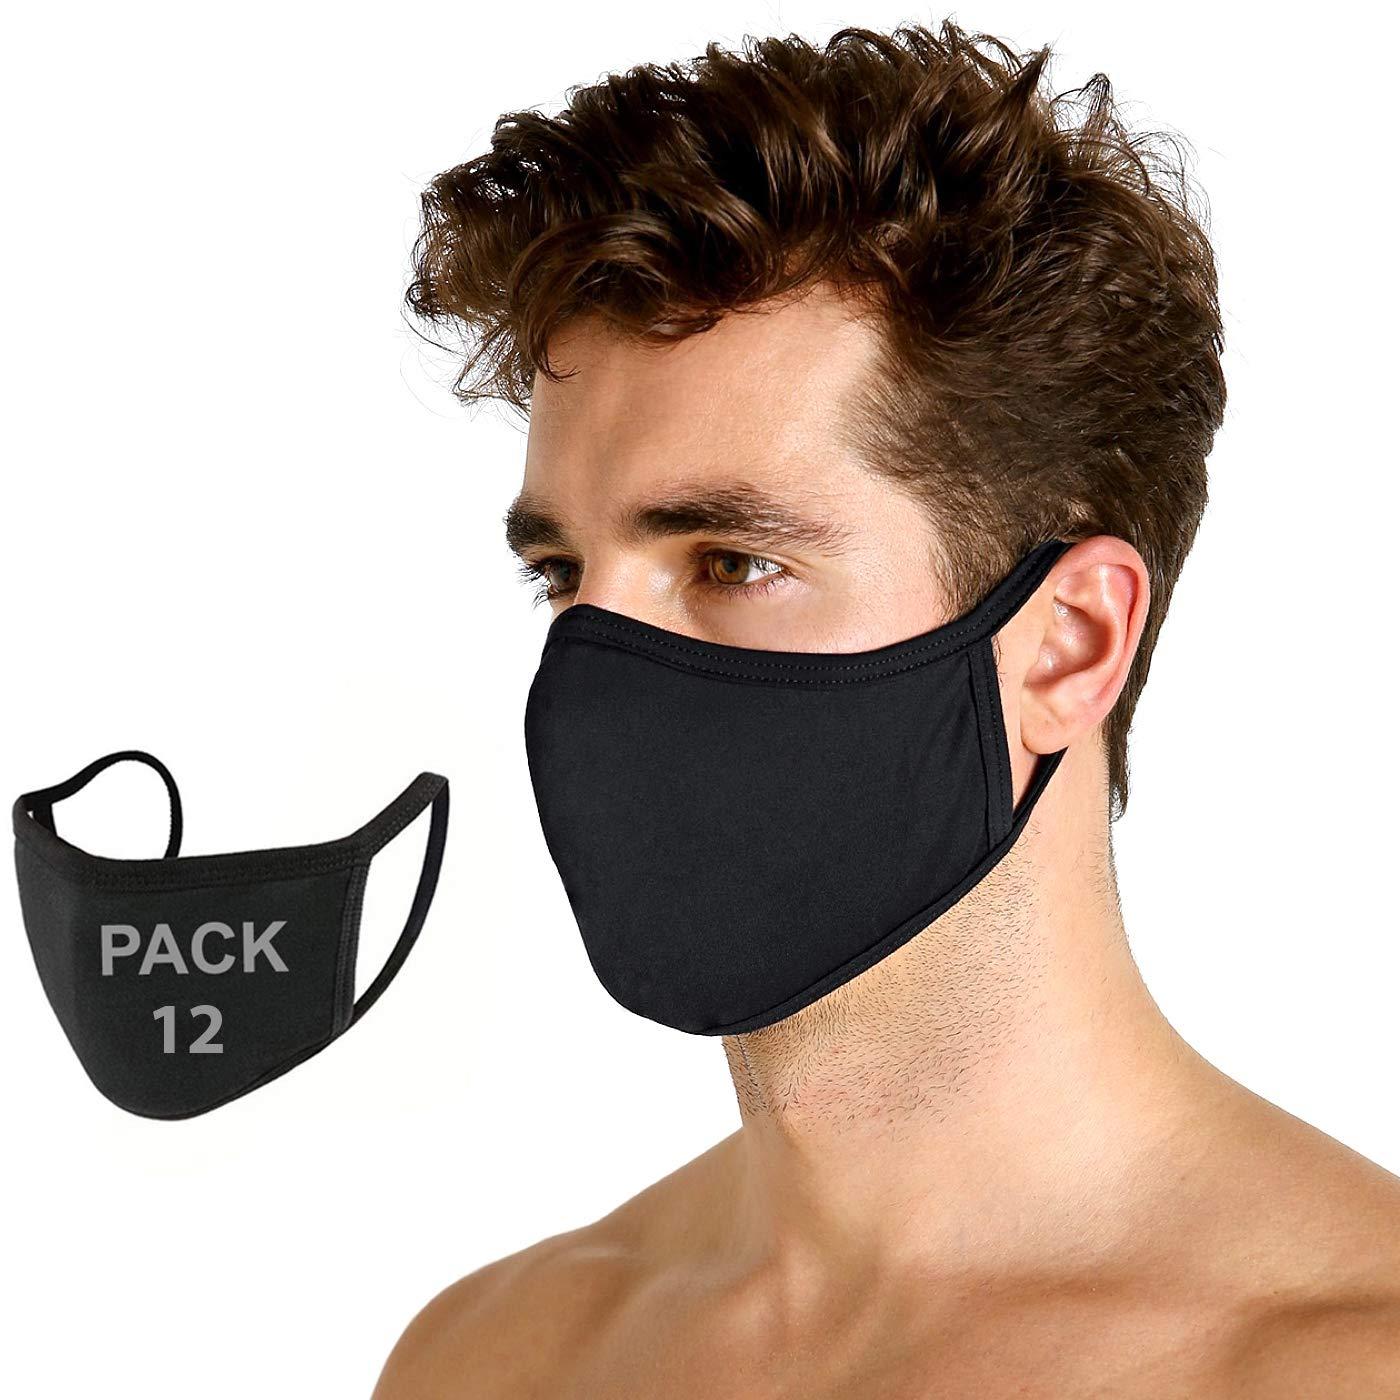 12 Pack Black Adult Face_Mask - Soft Material - Washable - Soft on Skin - Breathable Comfort